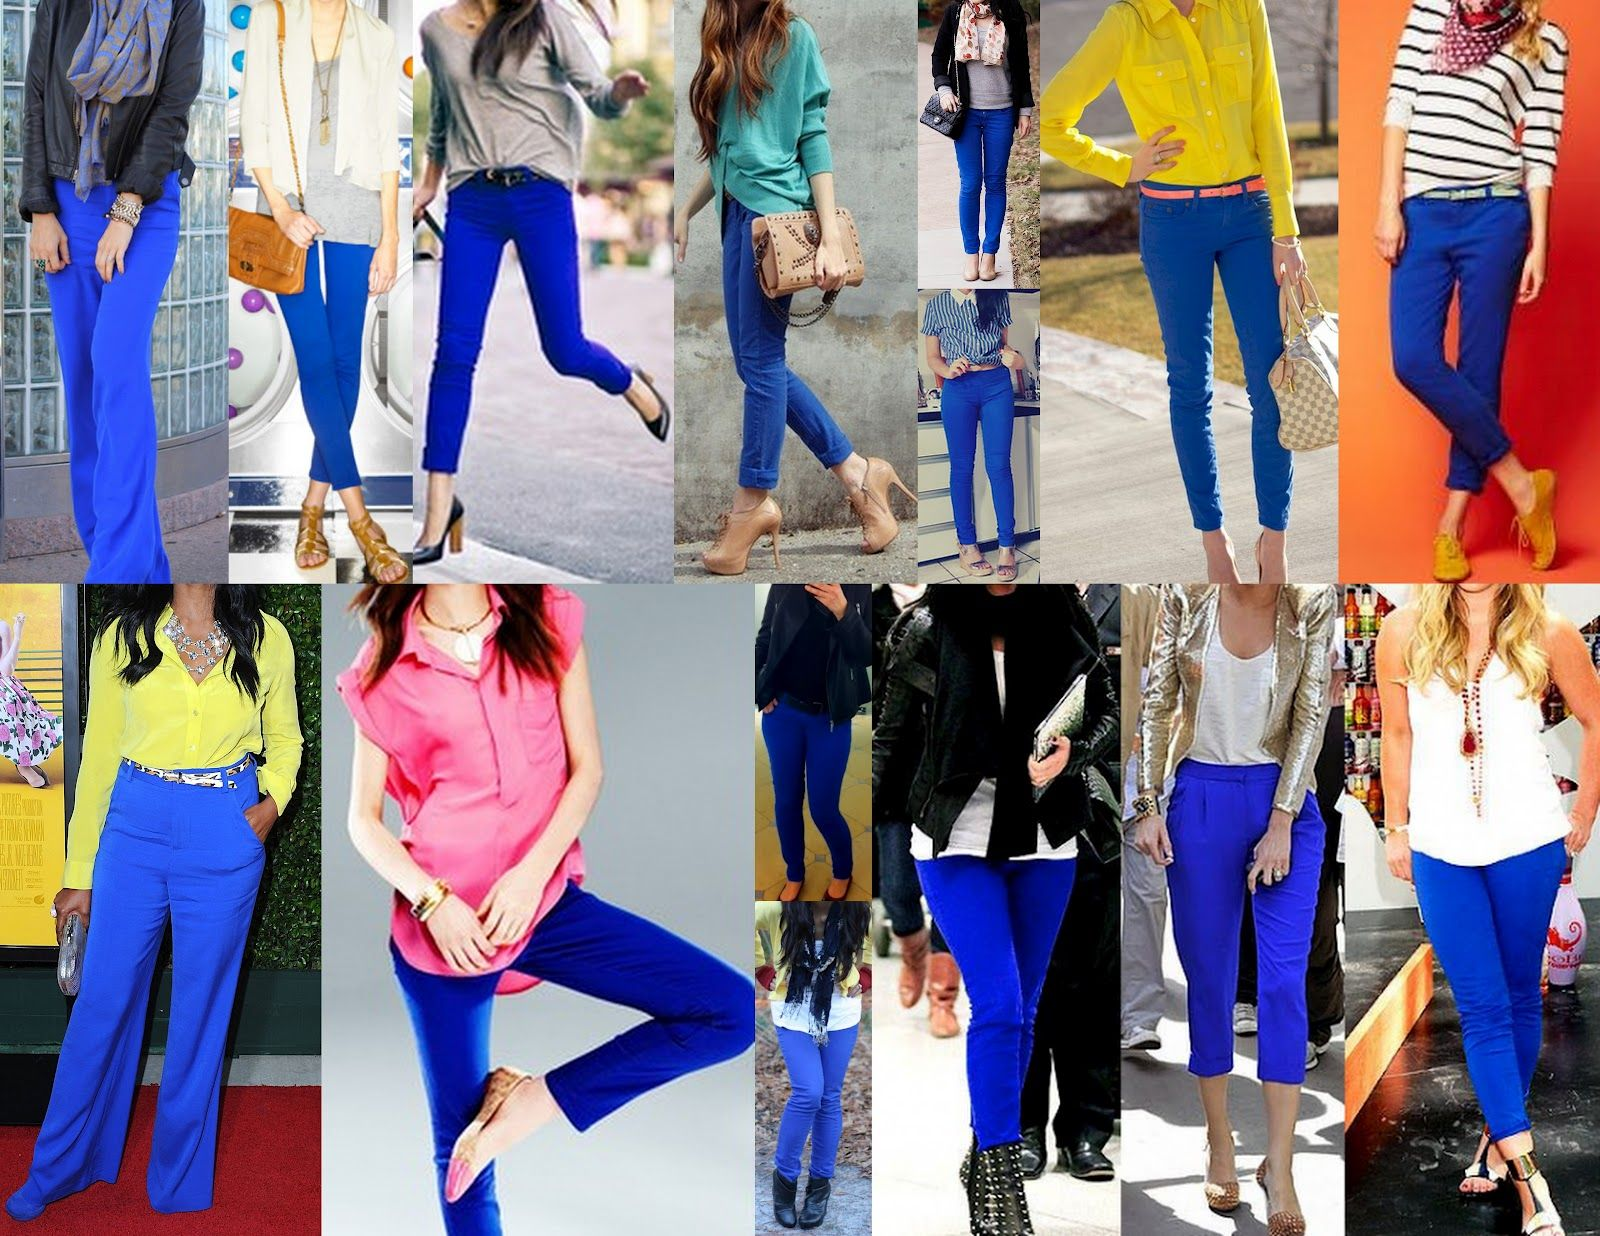 Rings bvlgari price list photo, Santana cara joey maalouf partner glam app